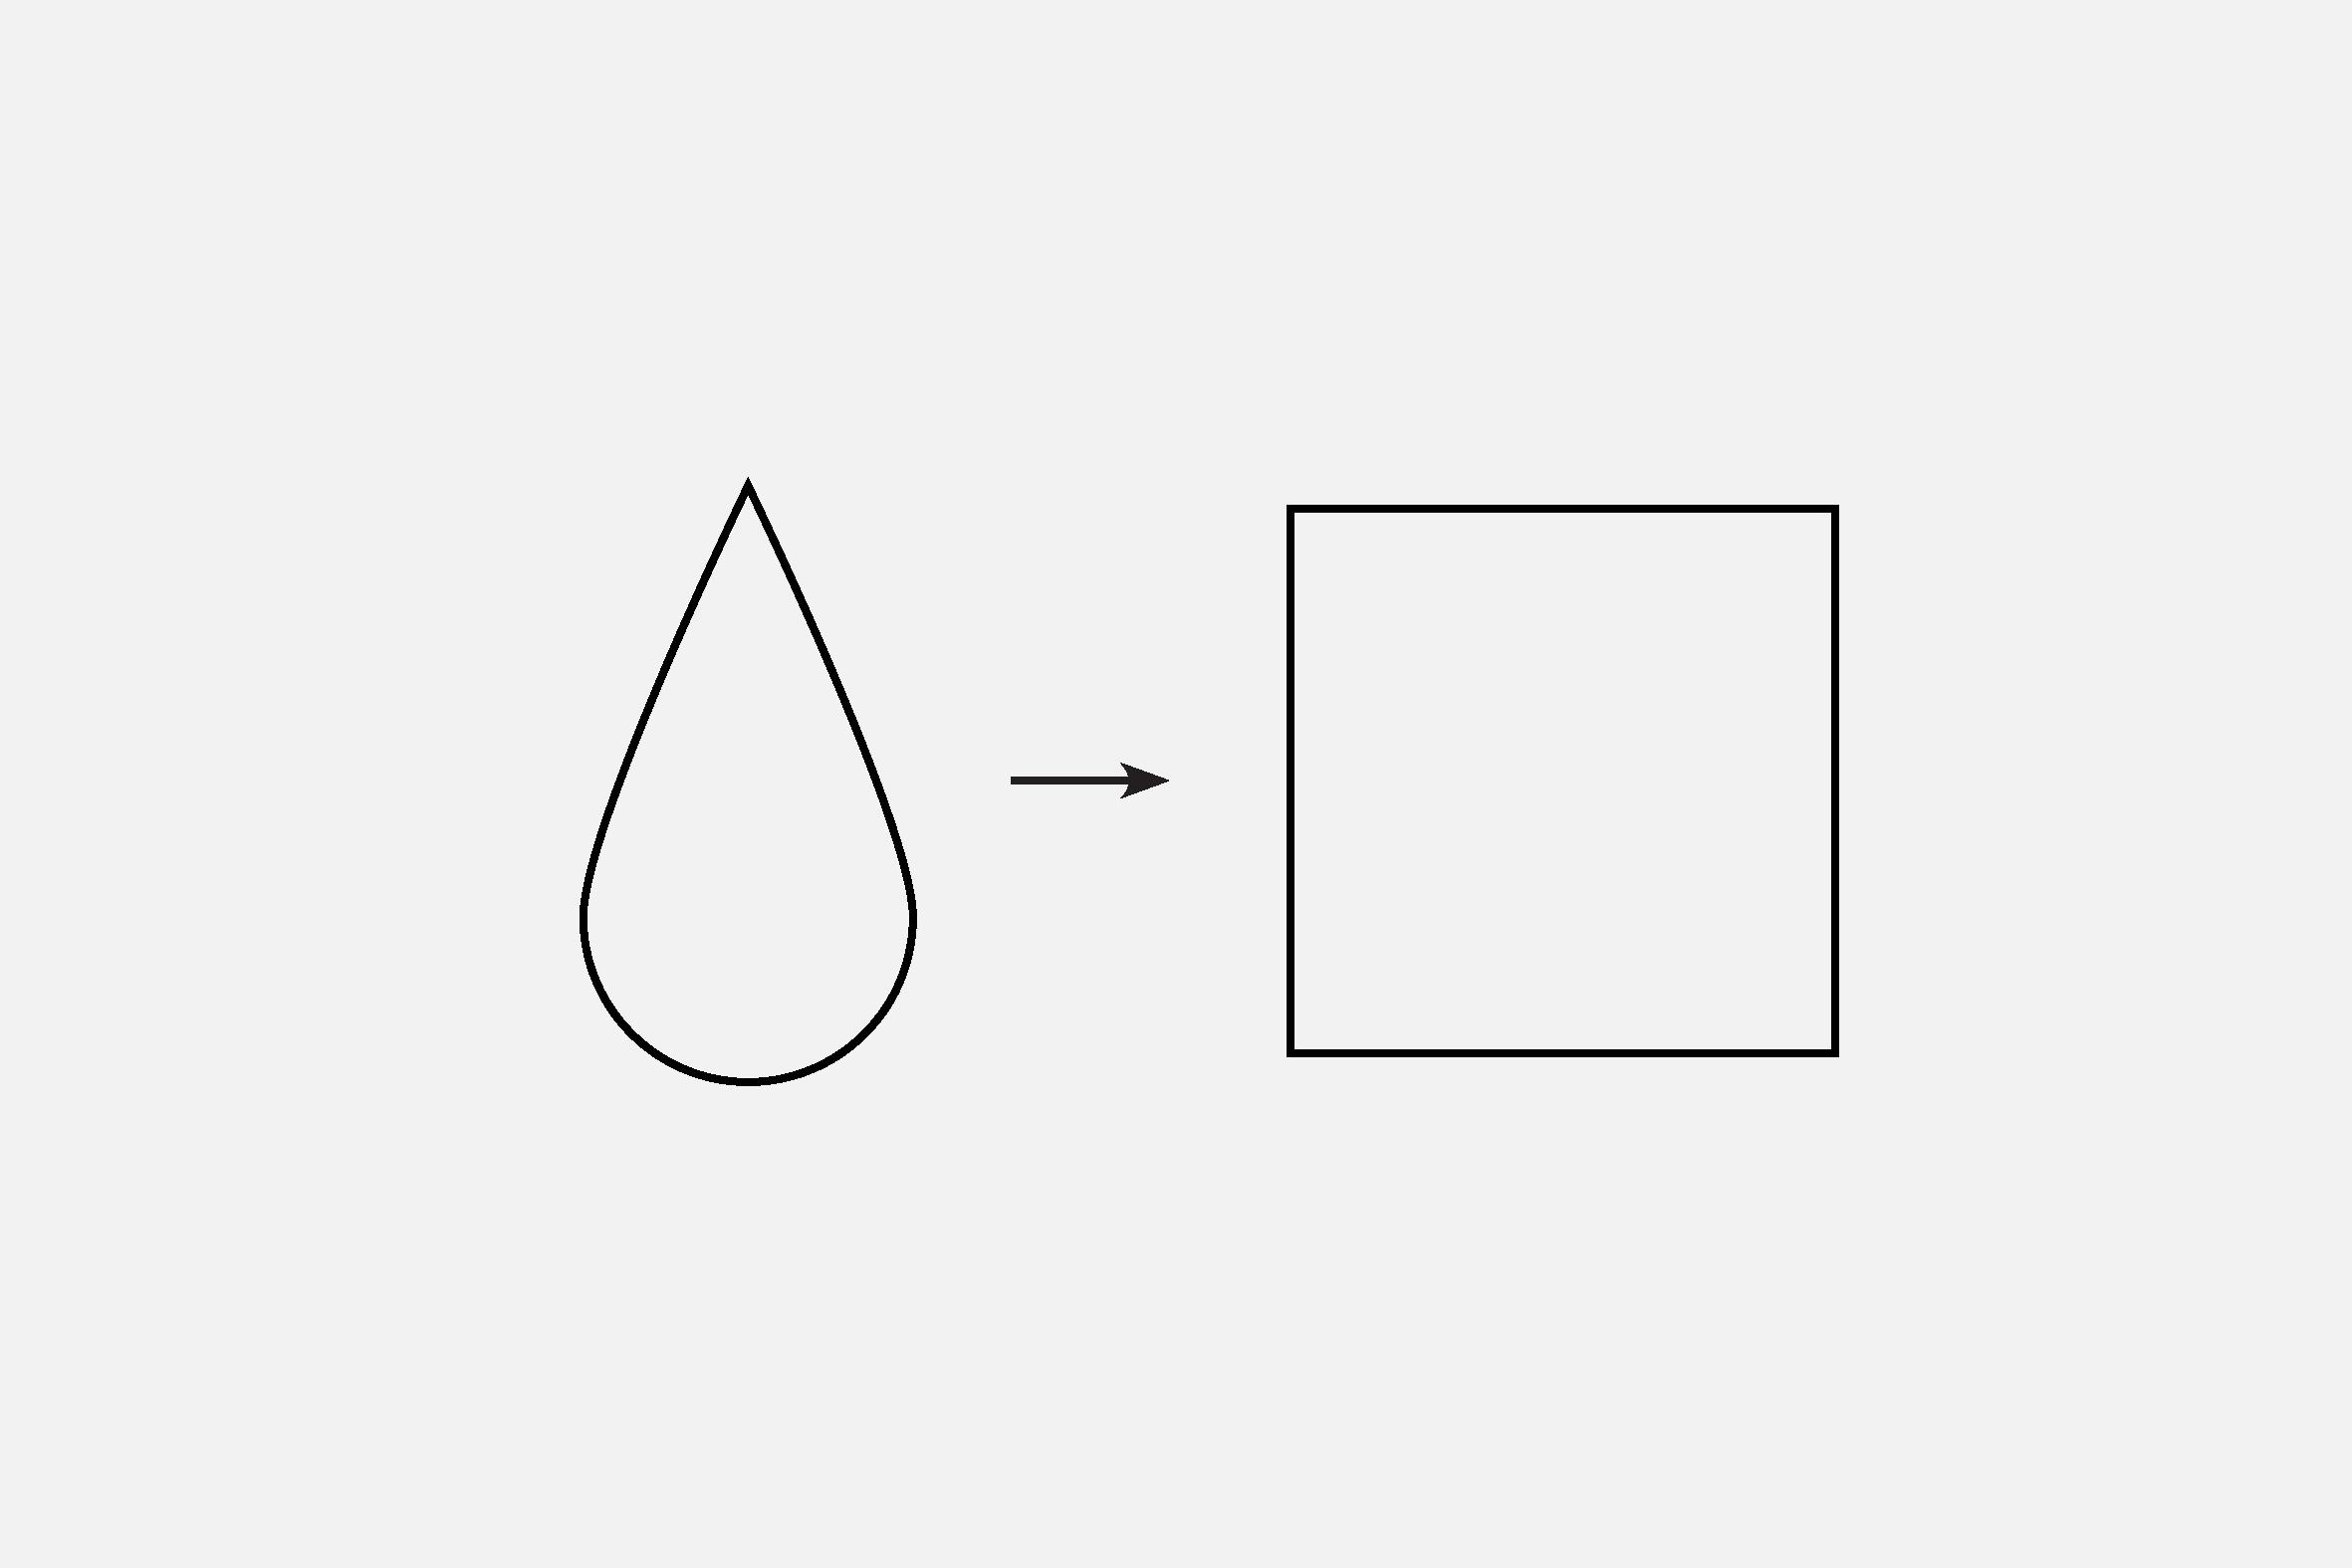 Bitflow-studio-droplite-logo-design-technology-startup-3